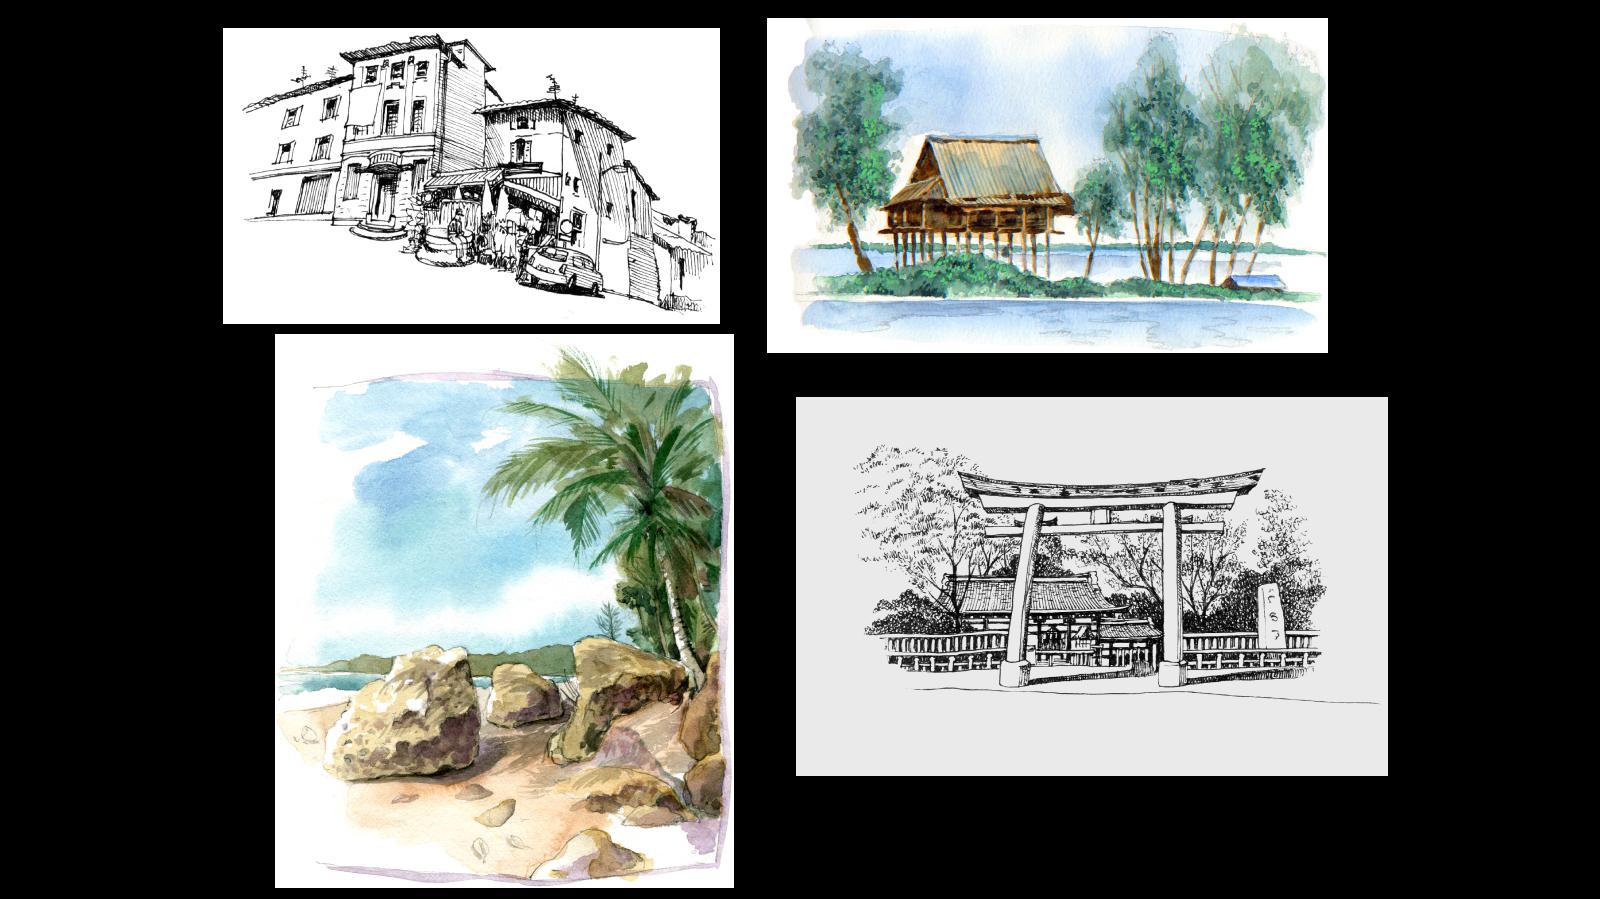 Sketches – Arles, Cambodia, Costa Rica, Shizouka